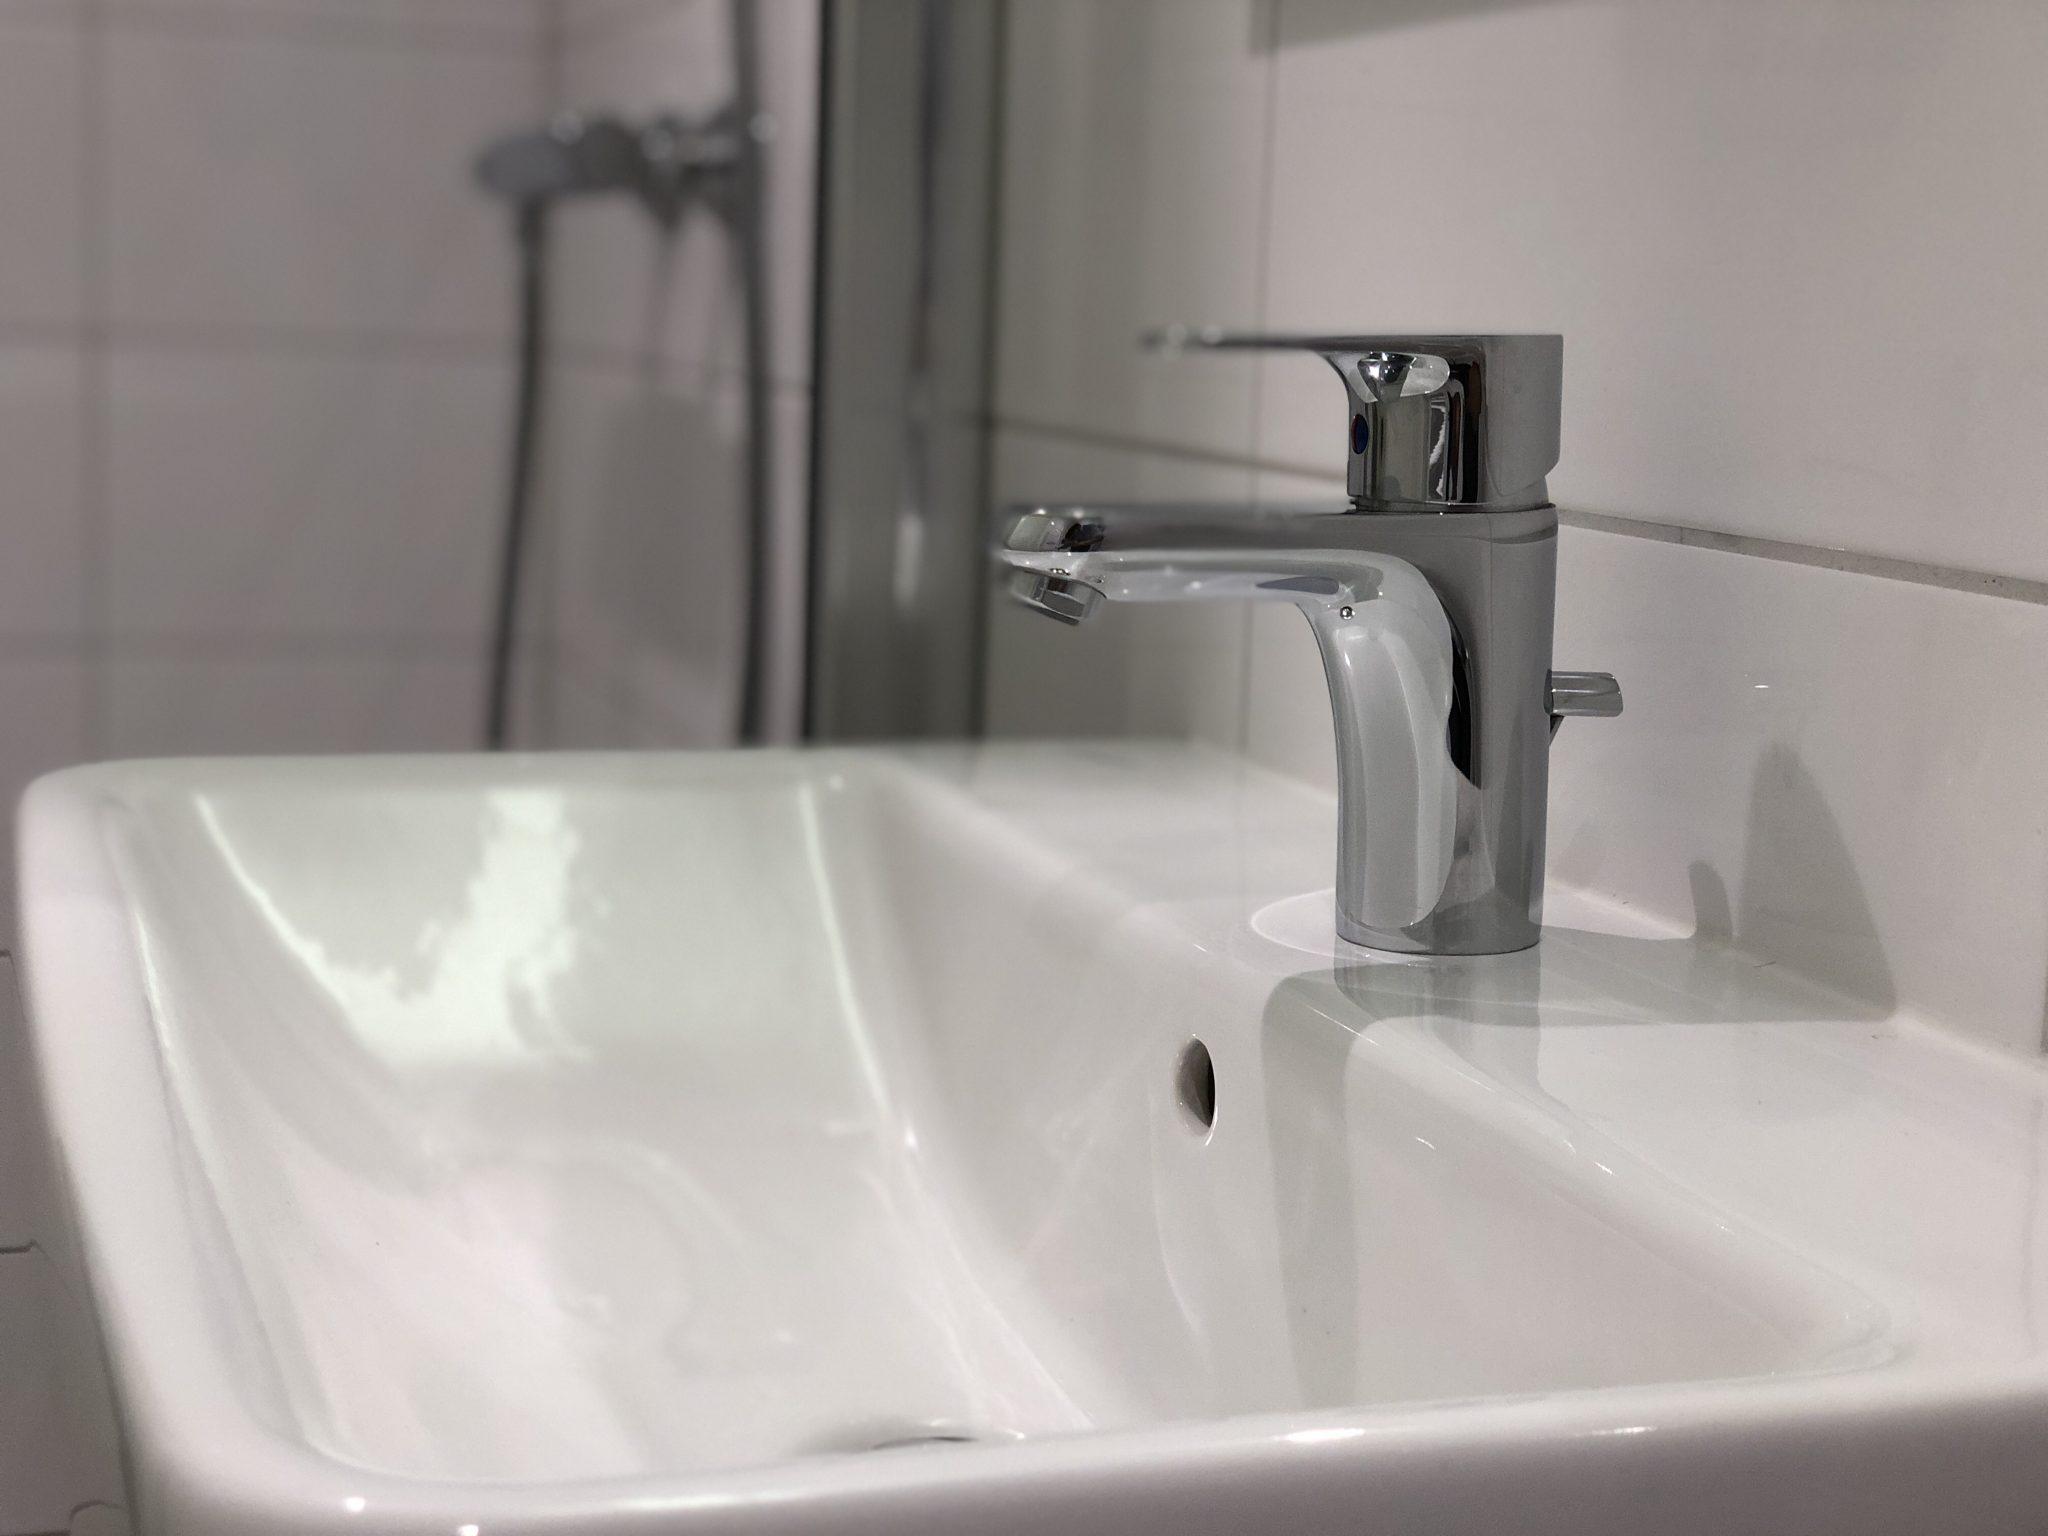 wastafel in een badkamer